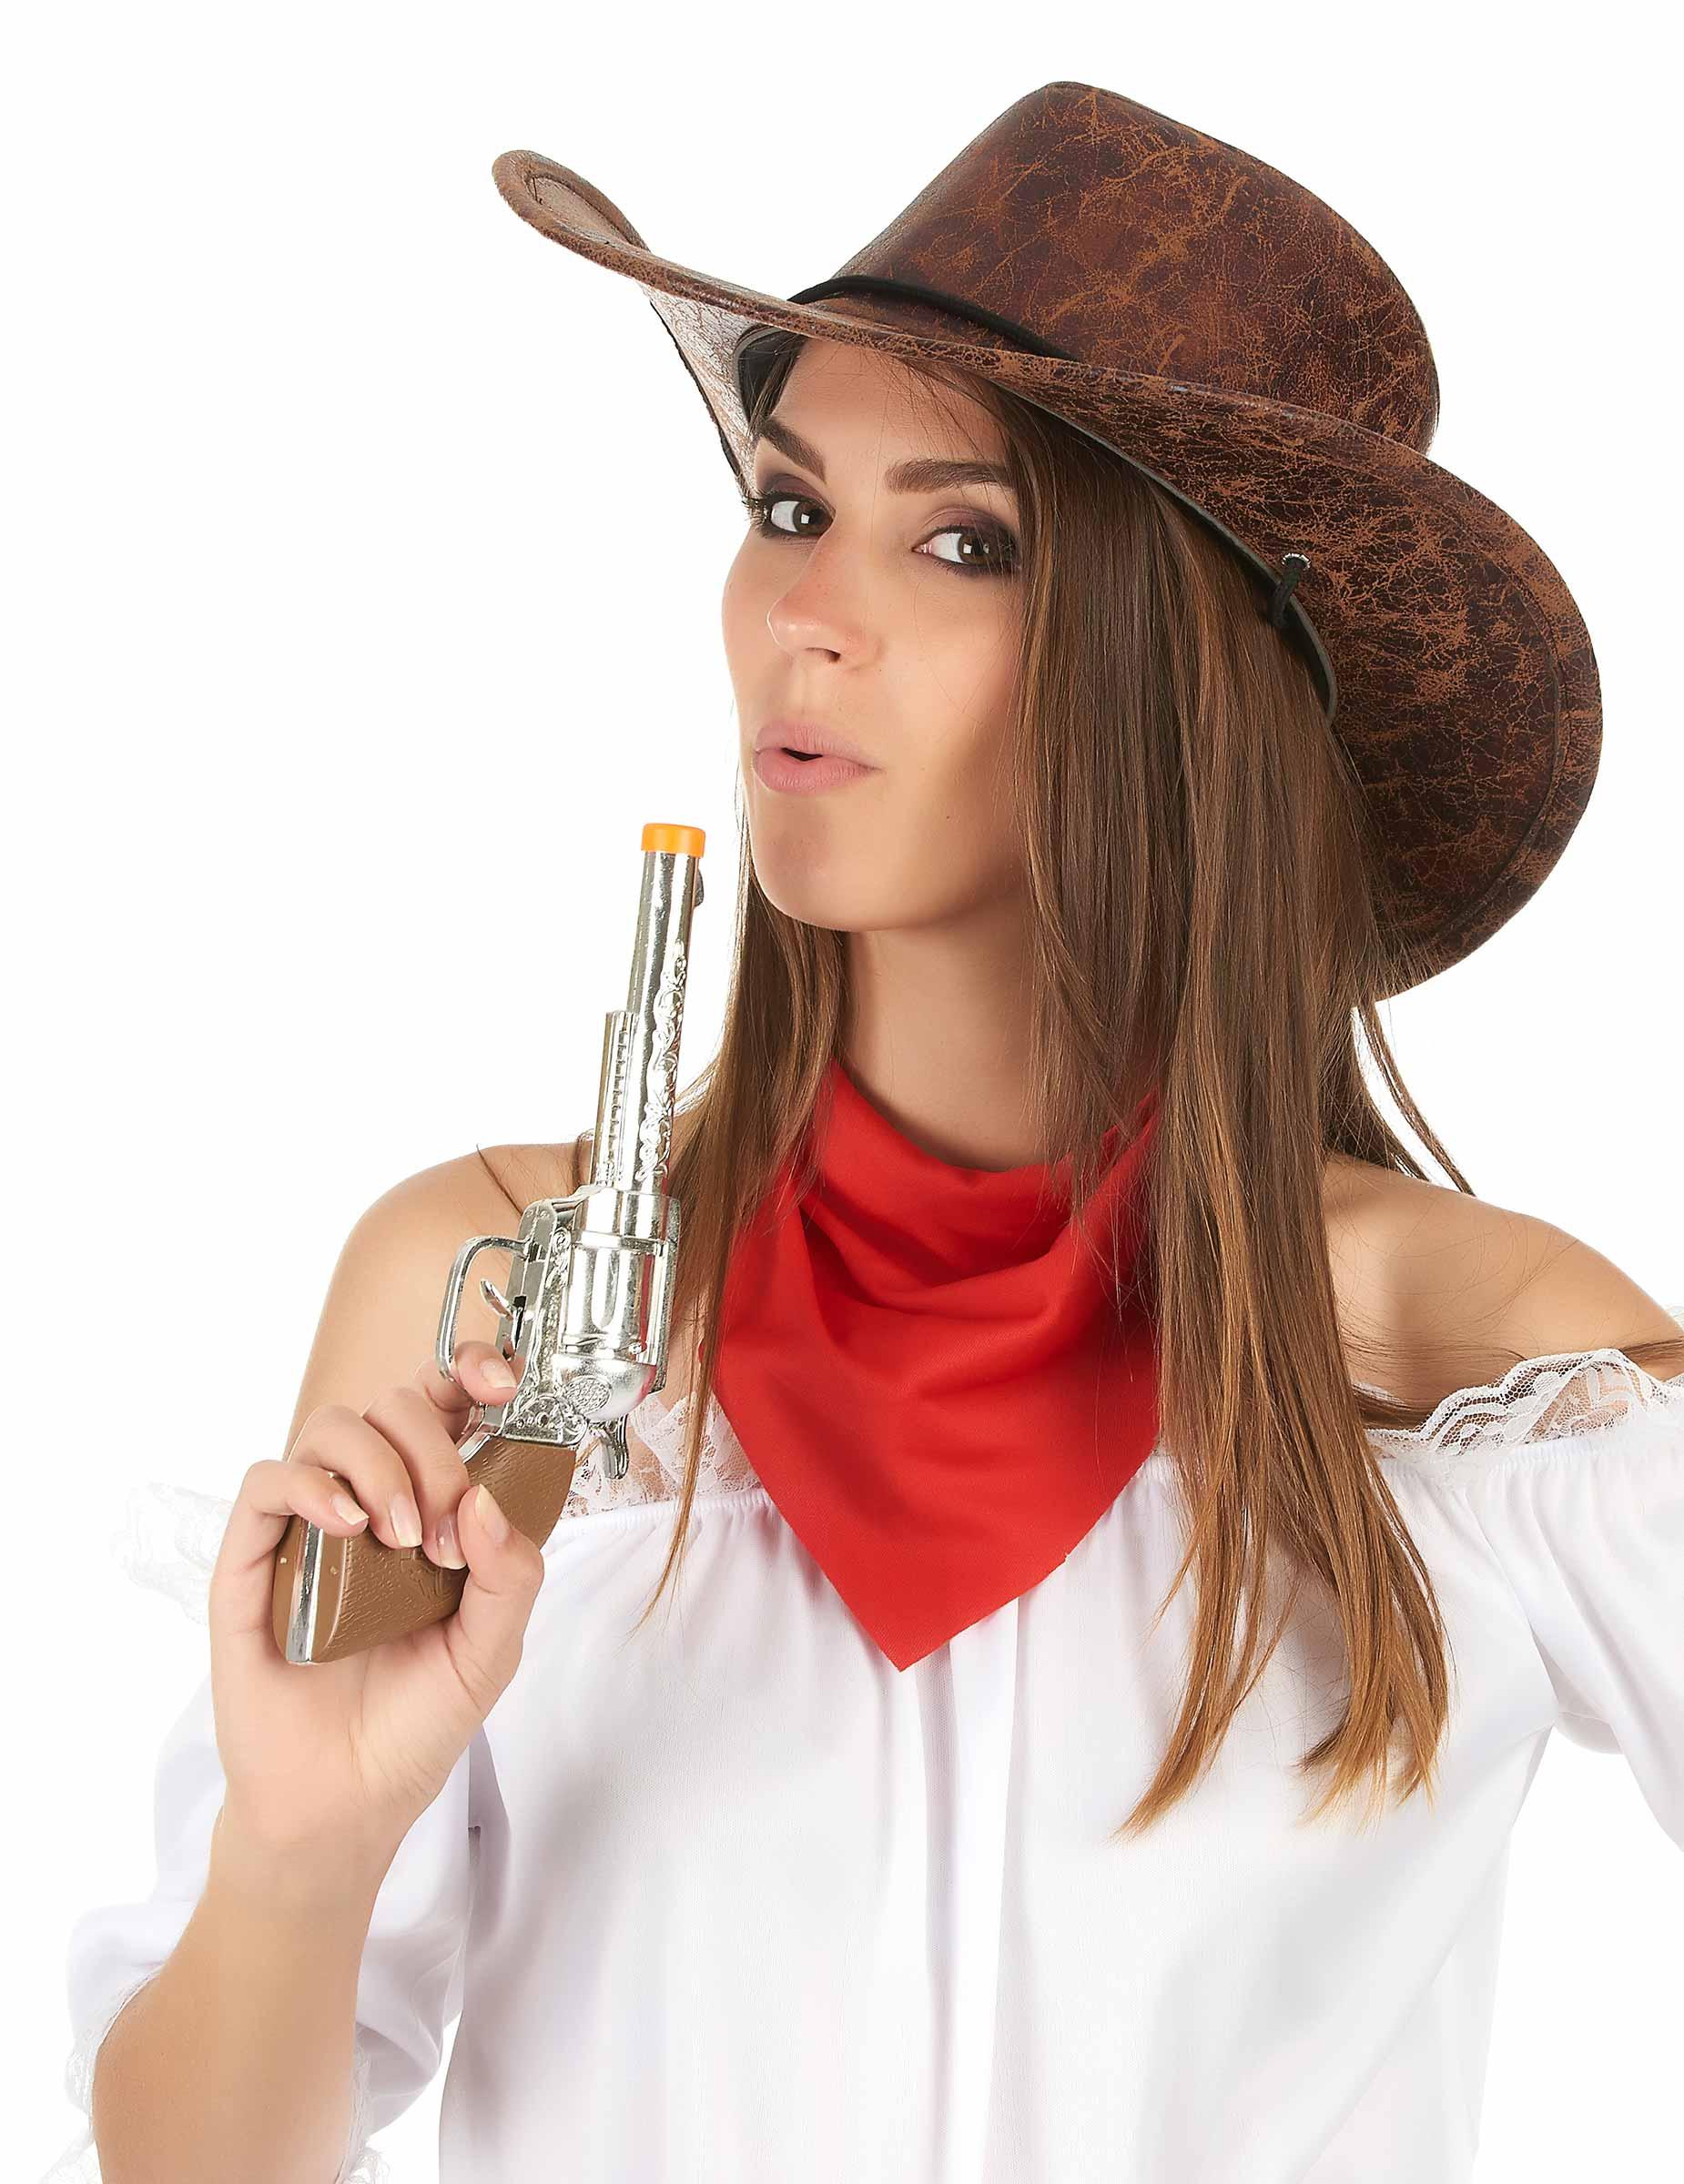 b340d0edf6f2d Chapéu de cowboy marron couro falso - adulto  Chapéus